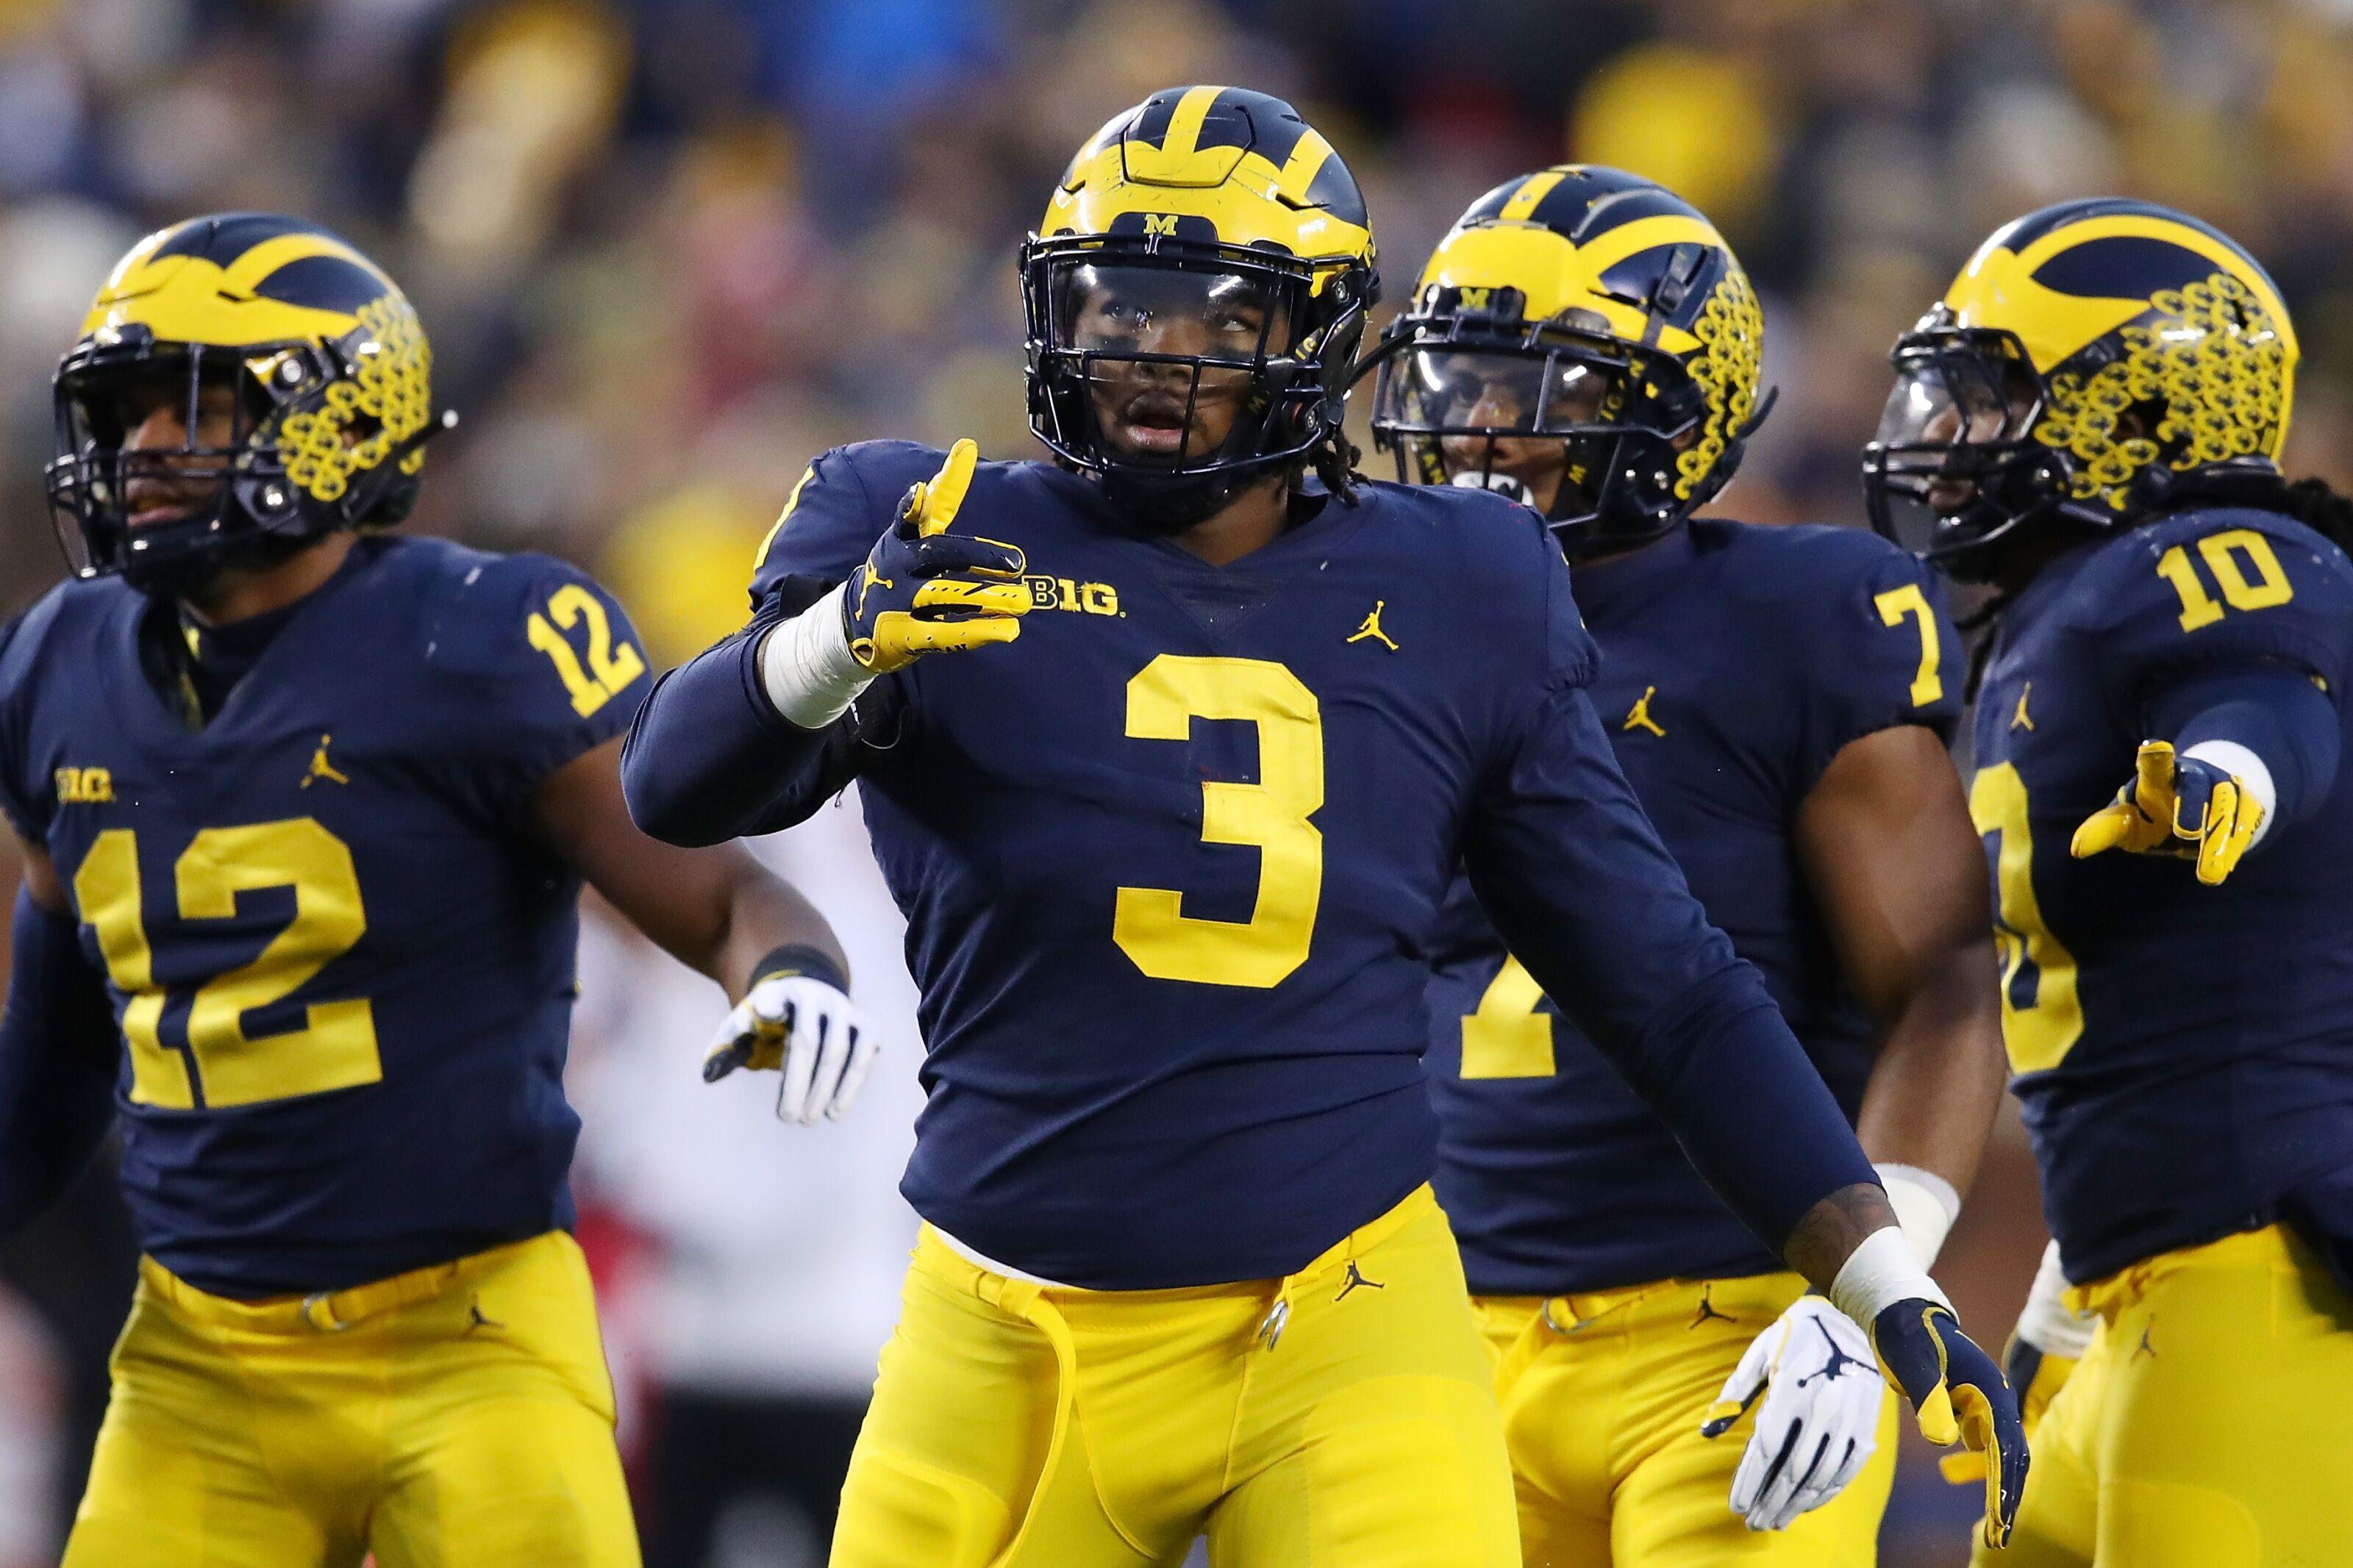 Michigan Football: Rashan Gary turned down $300K to play for Wolverines